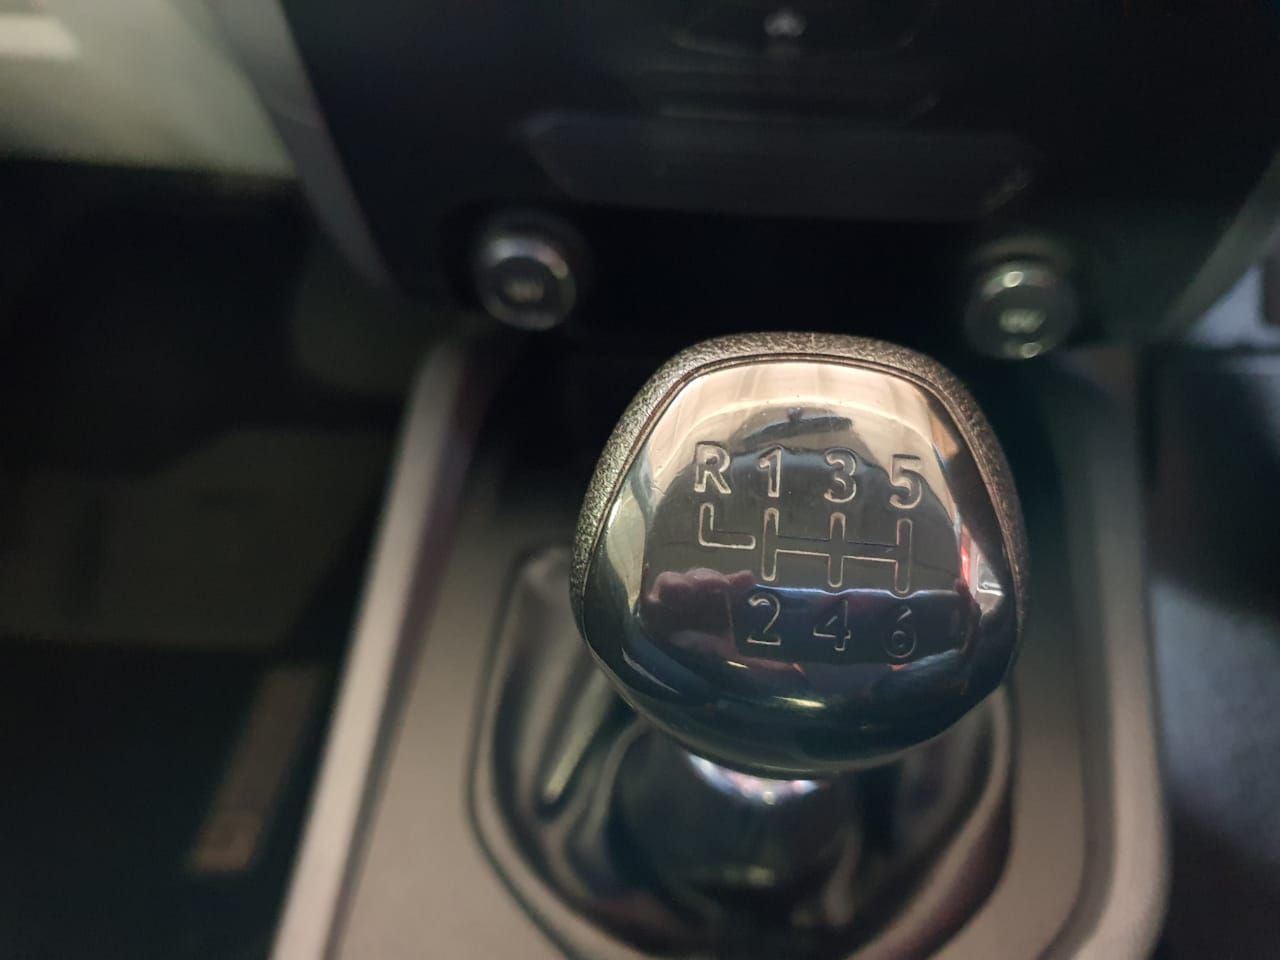 2017 FORD RANGER 2.2 TDCI XL P/U SUP/CAB full